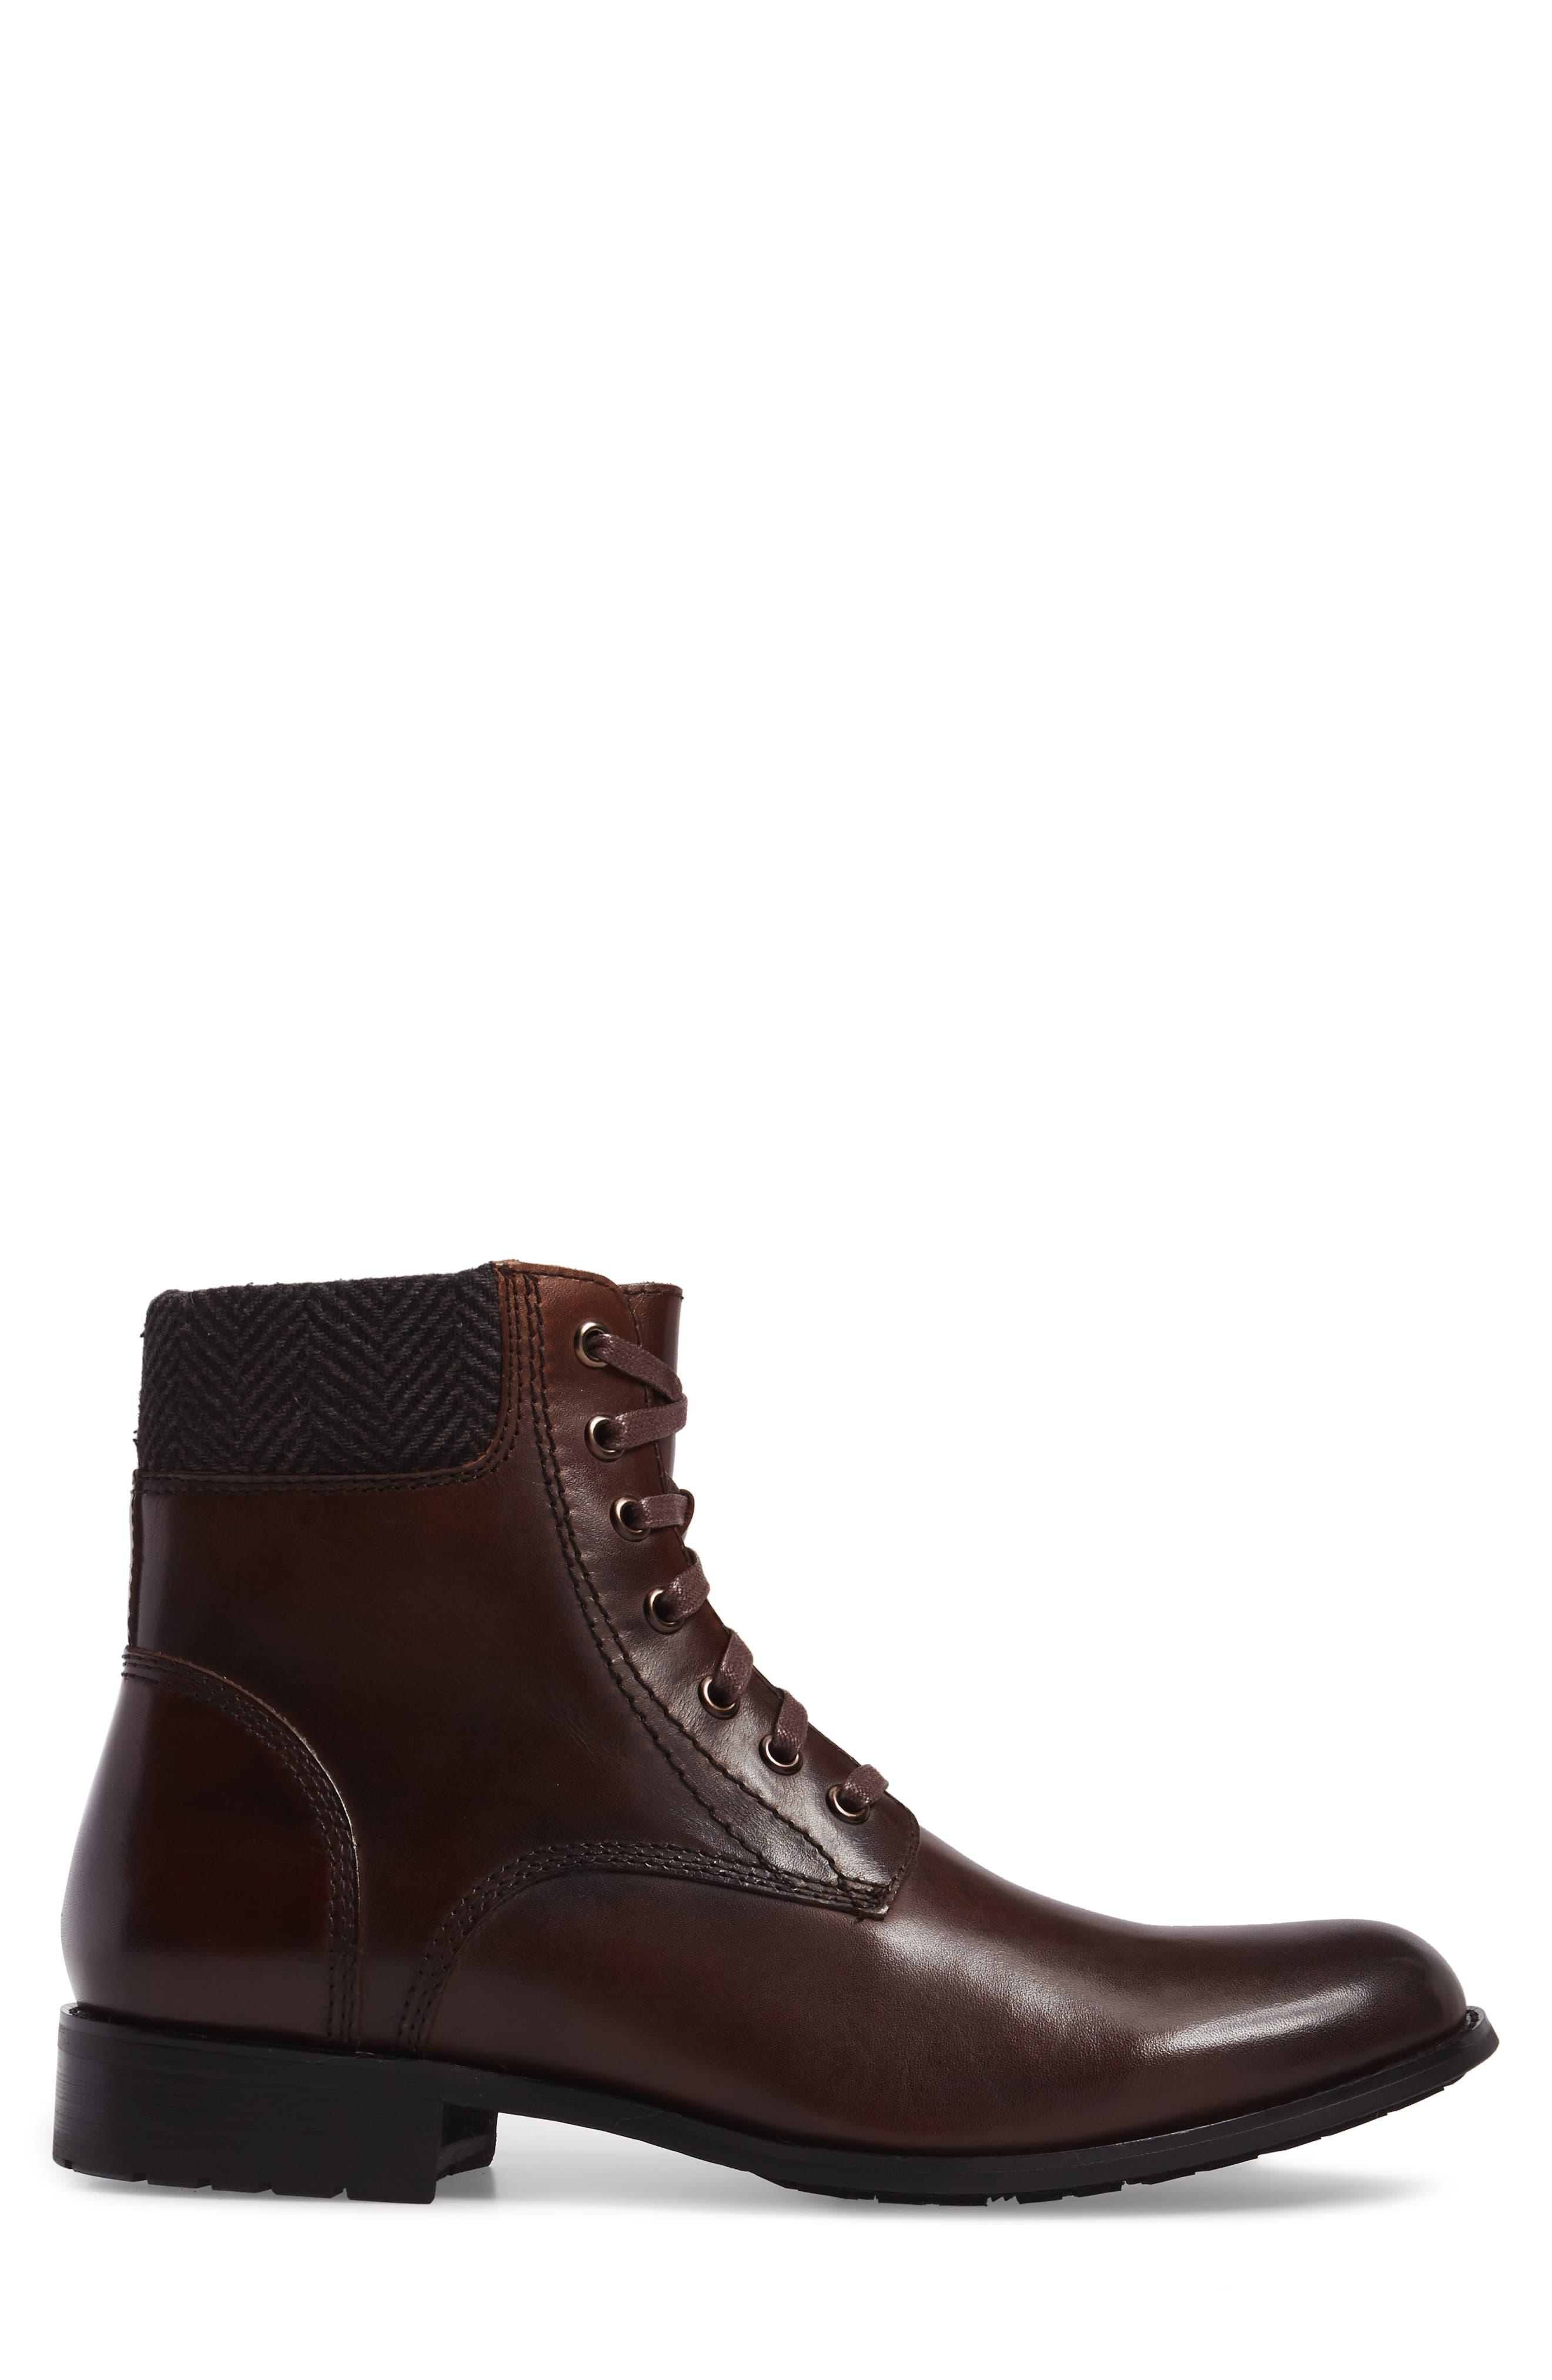 Saar Plain Toe Boot,                             Alternate thumbnail 3, color,                             Brown Leather